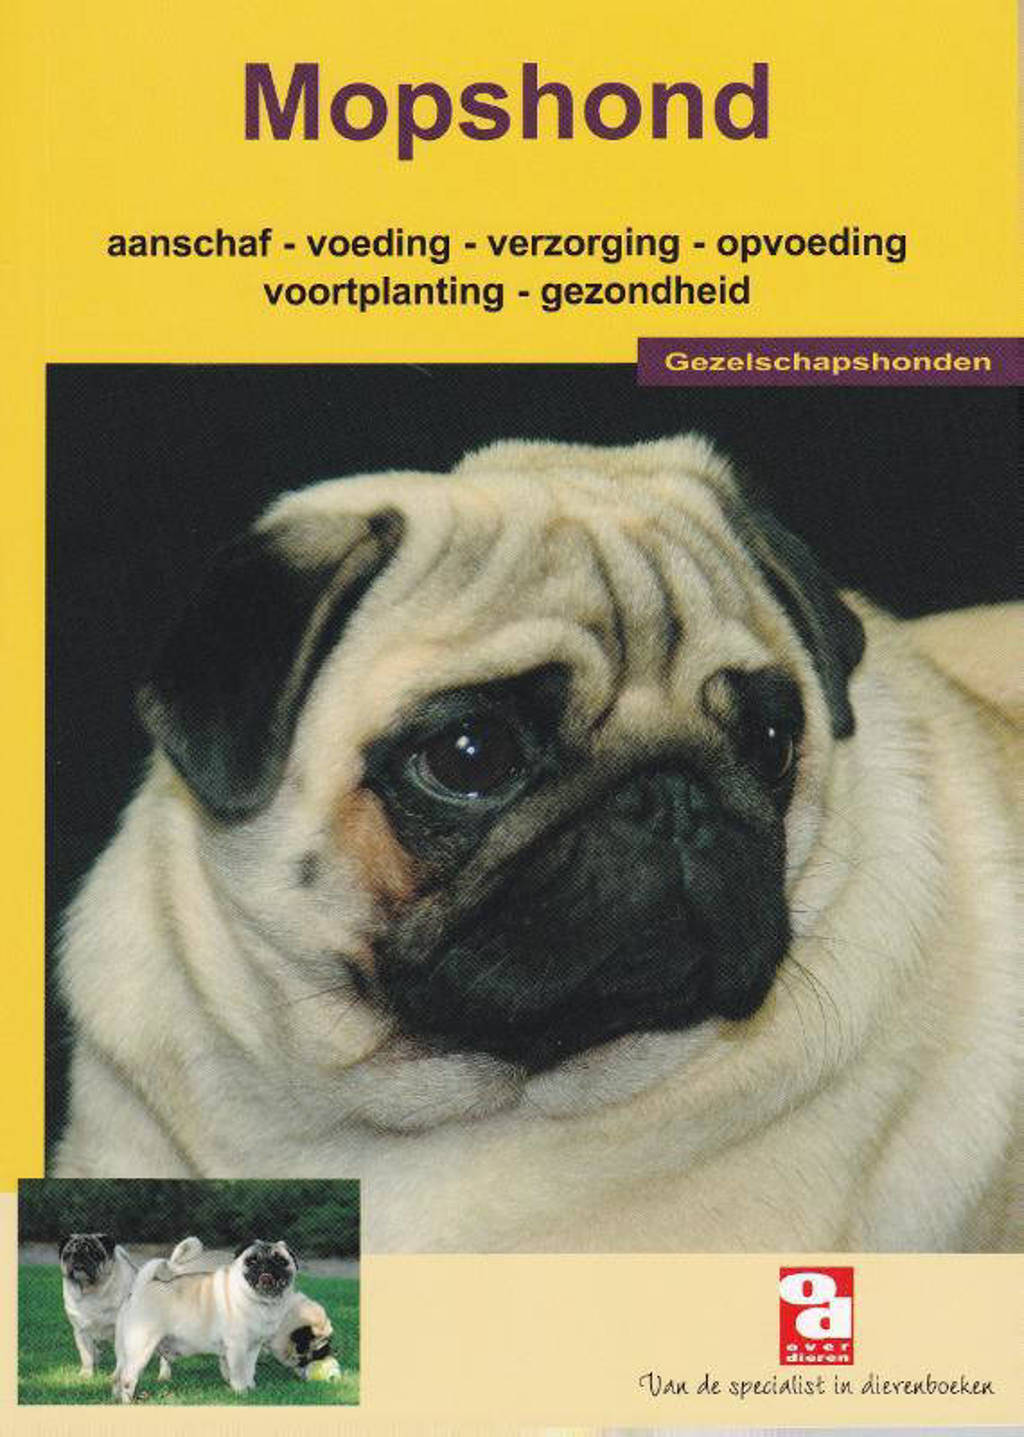 Over Dieren: De mopshond